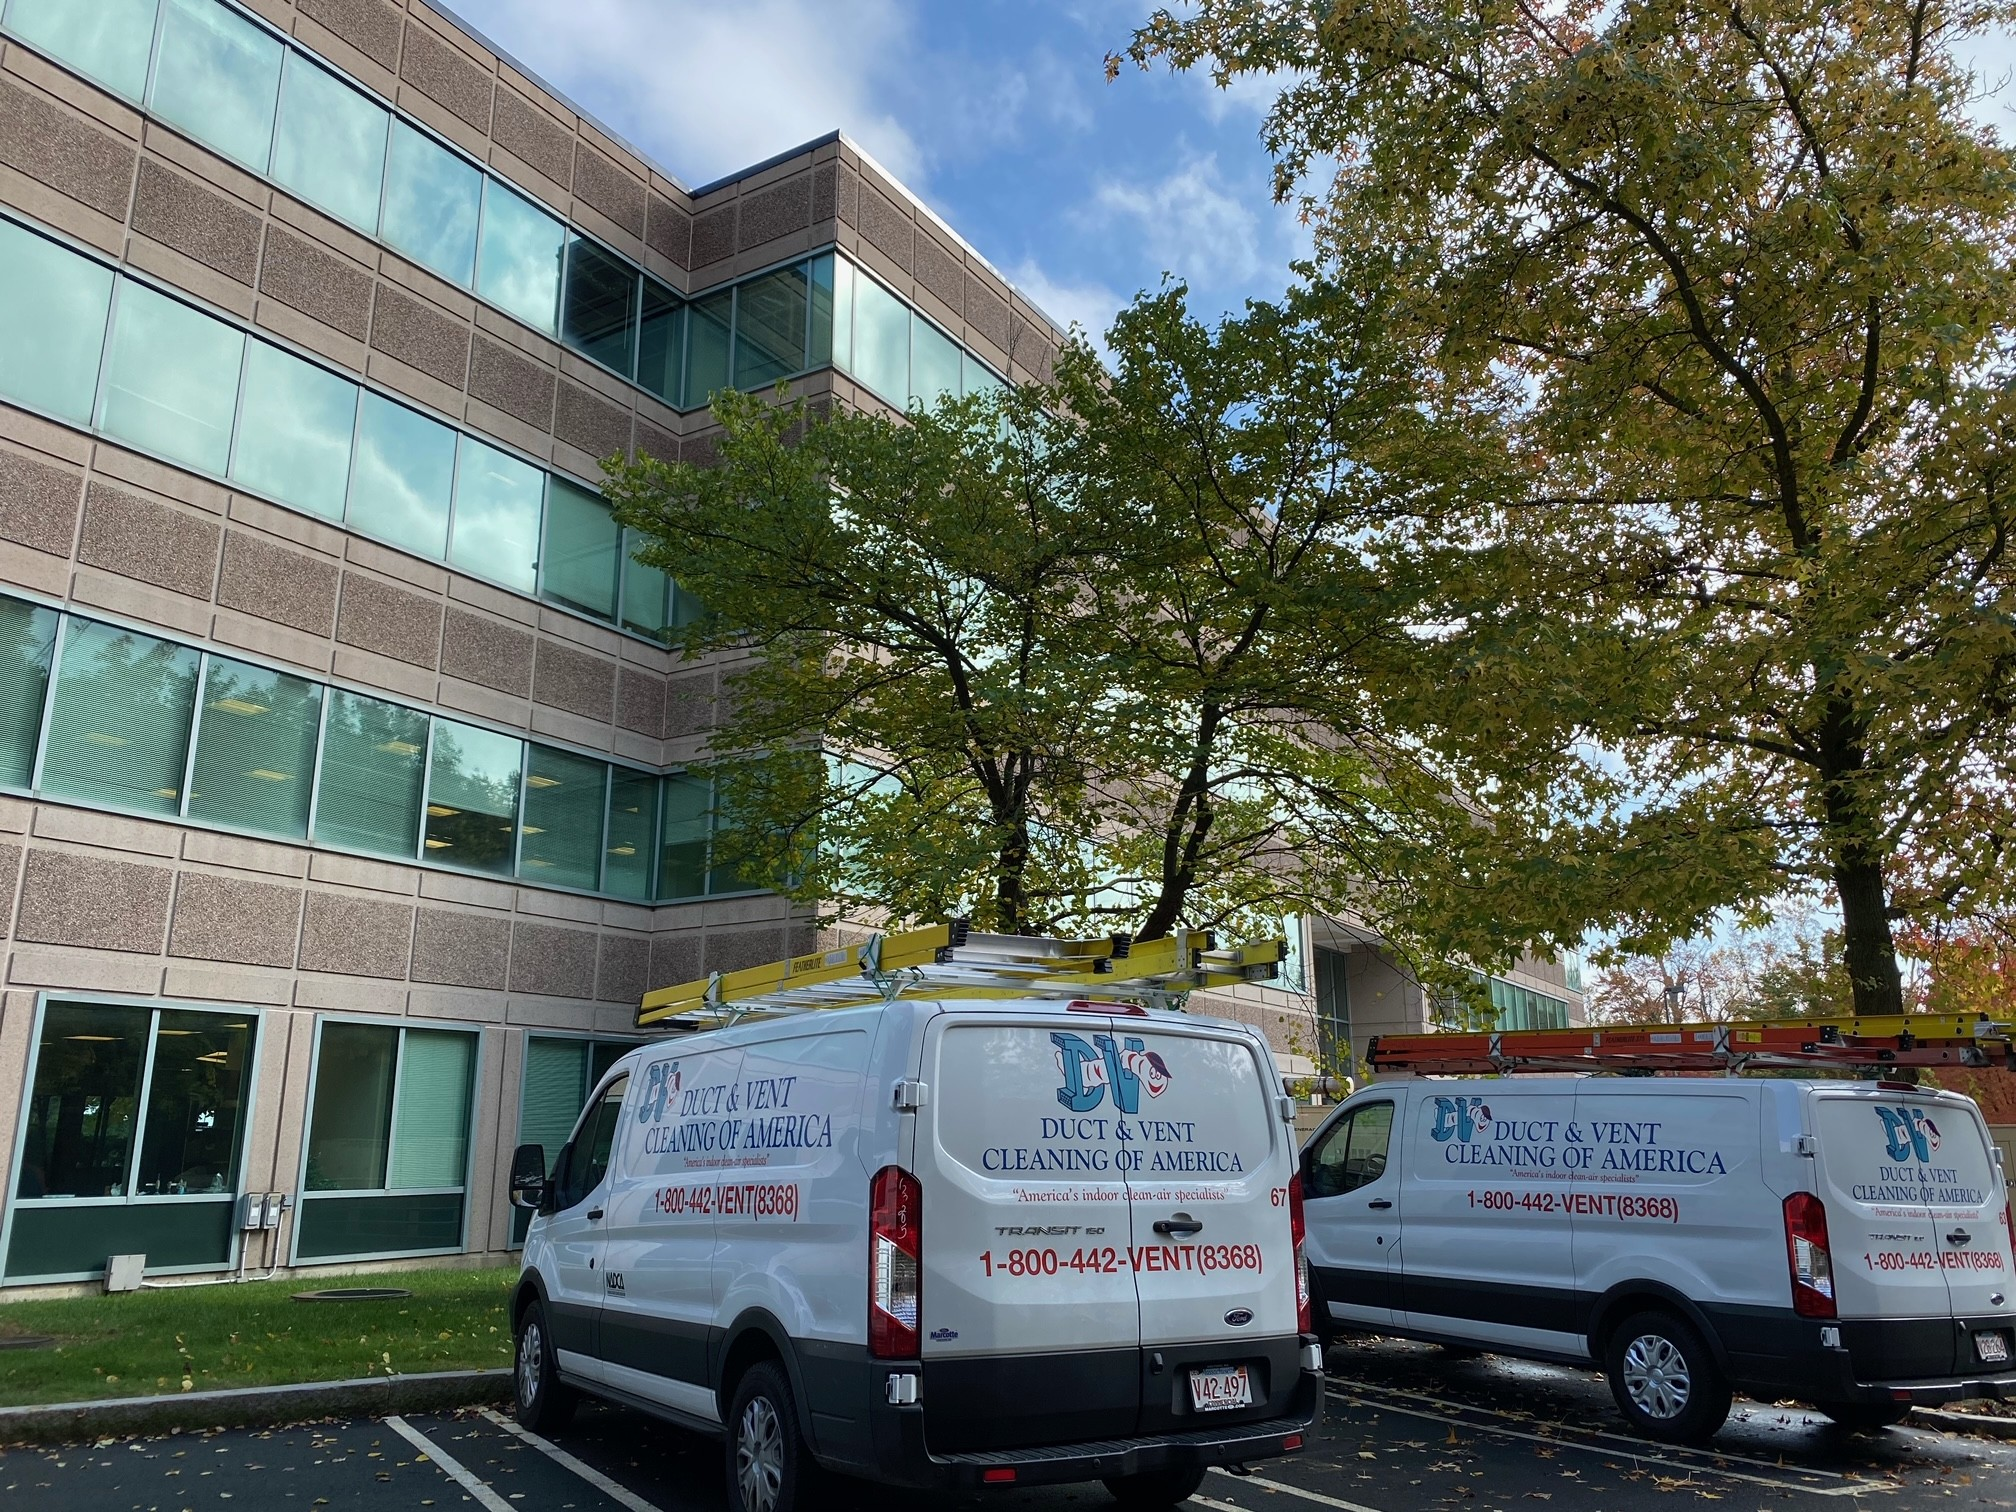 Office Building – Milford, CT image003.jpg